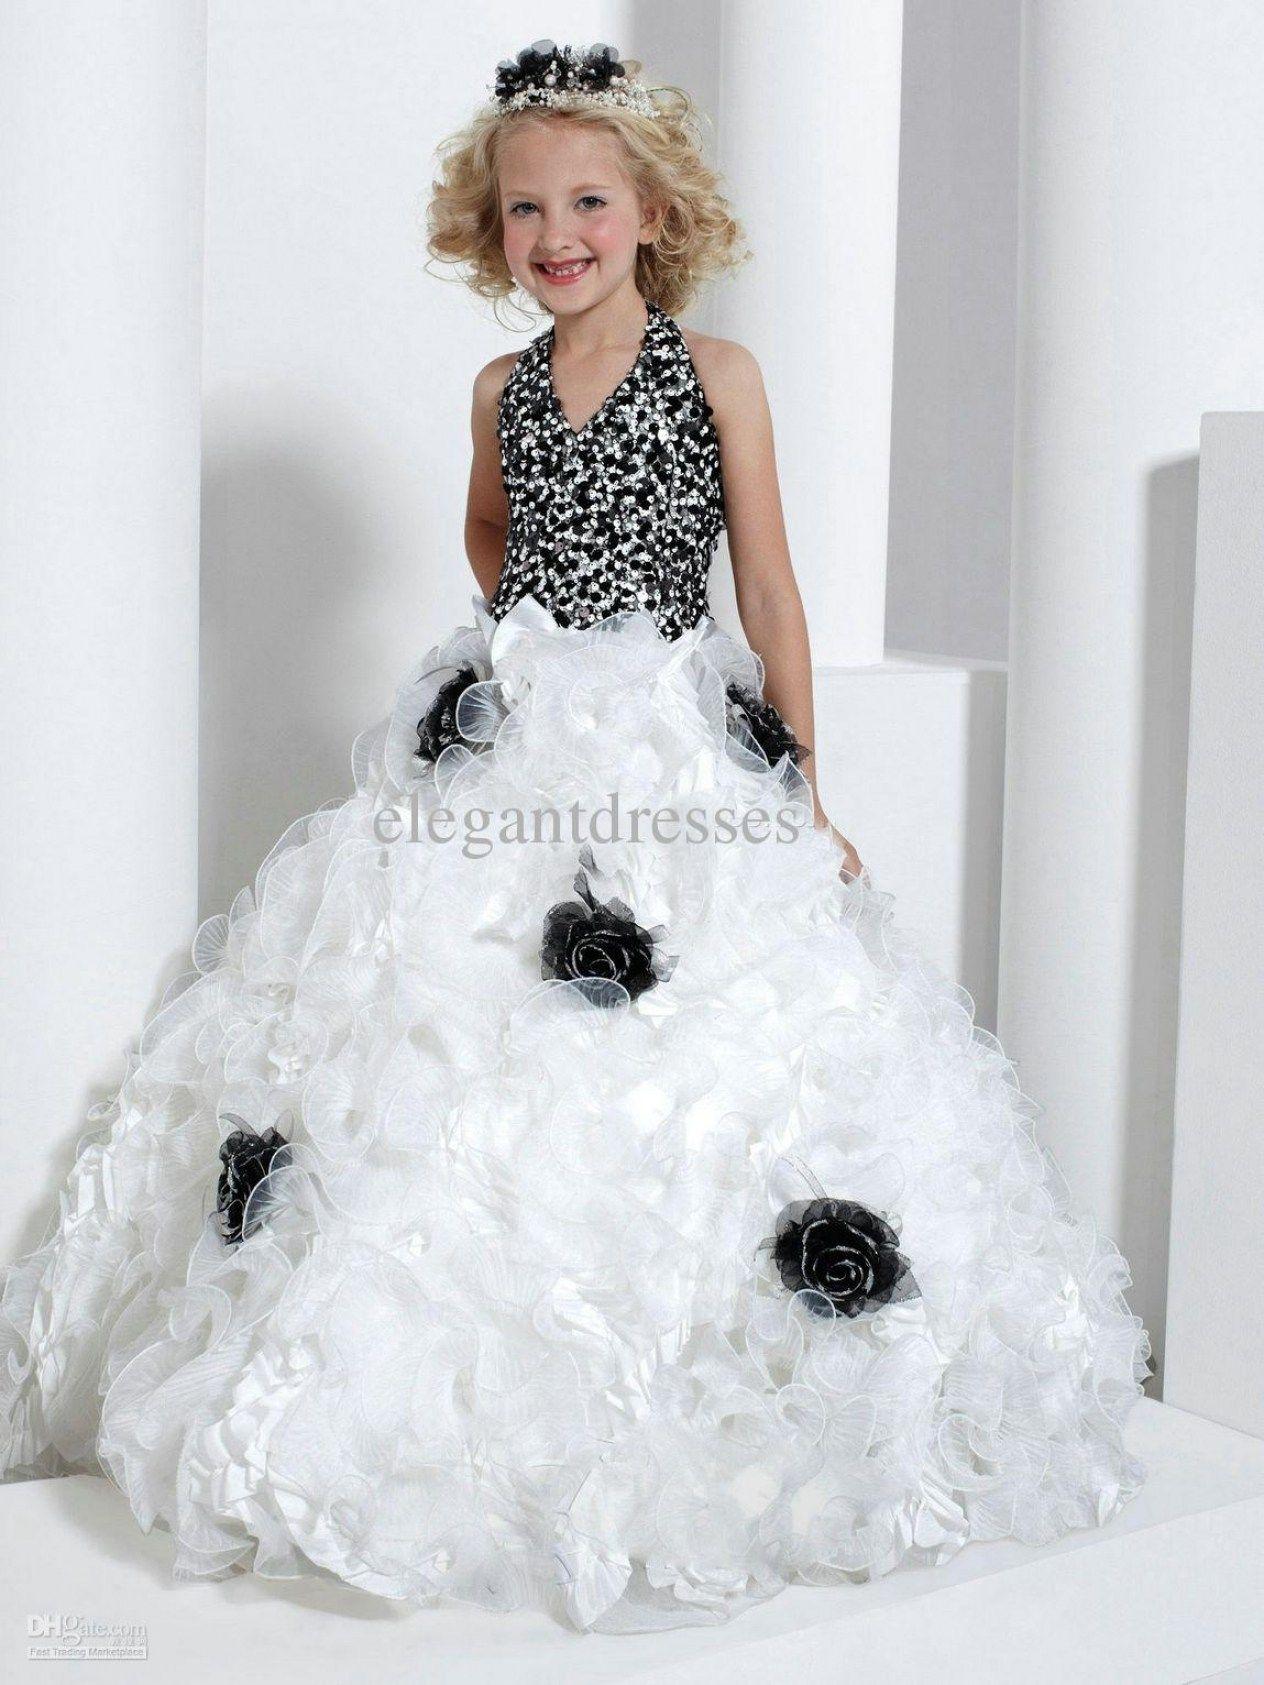 30 Beautiful White Wedding Dress With Black Flowers Pinterest